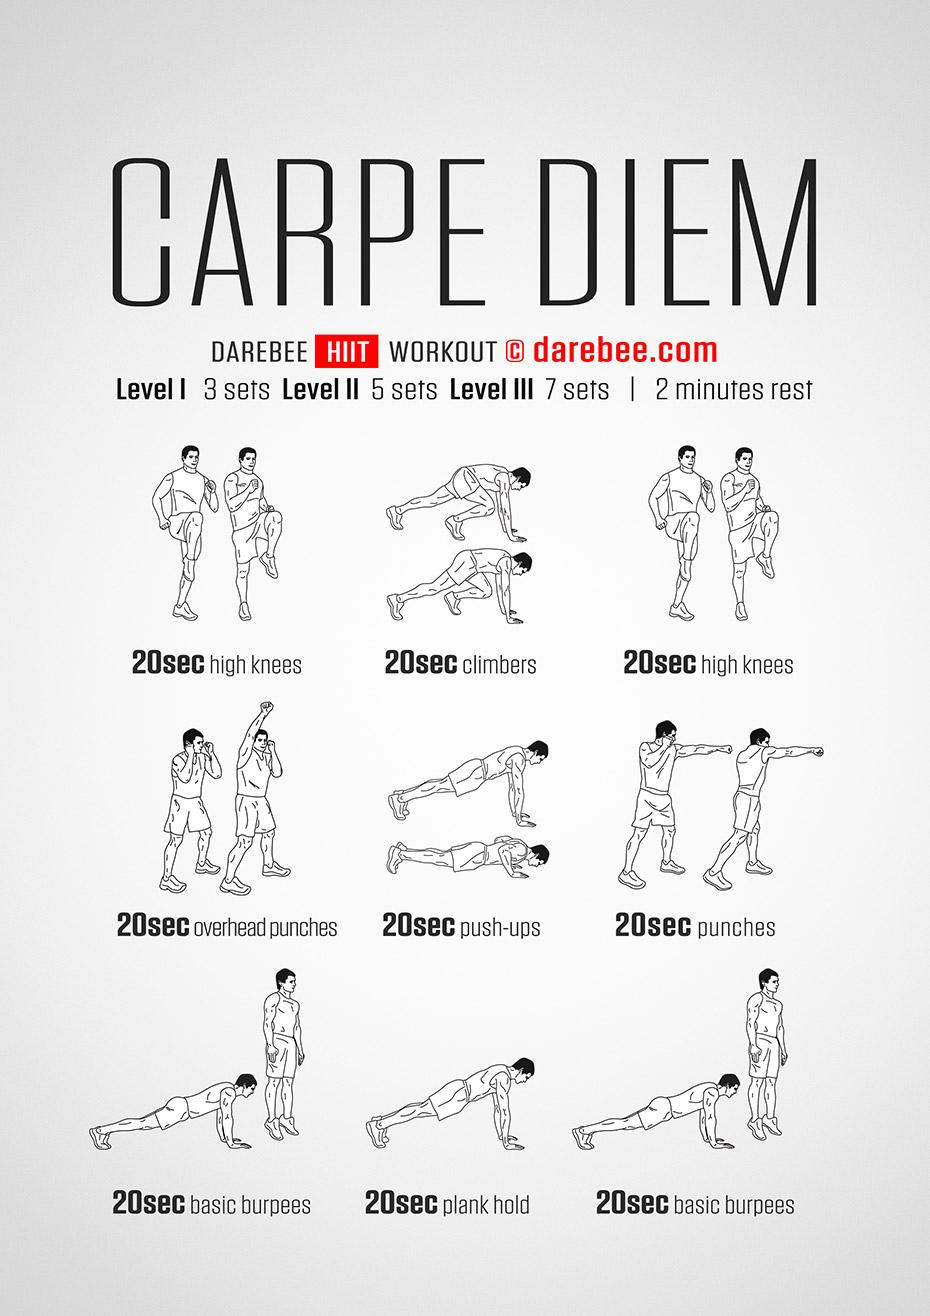 Carpe diem workout for What does carp mean